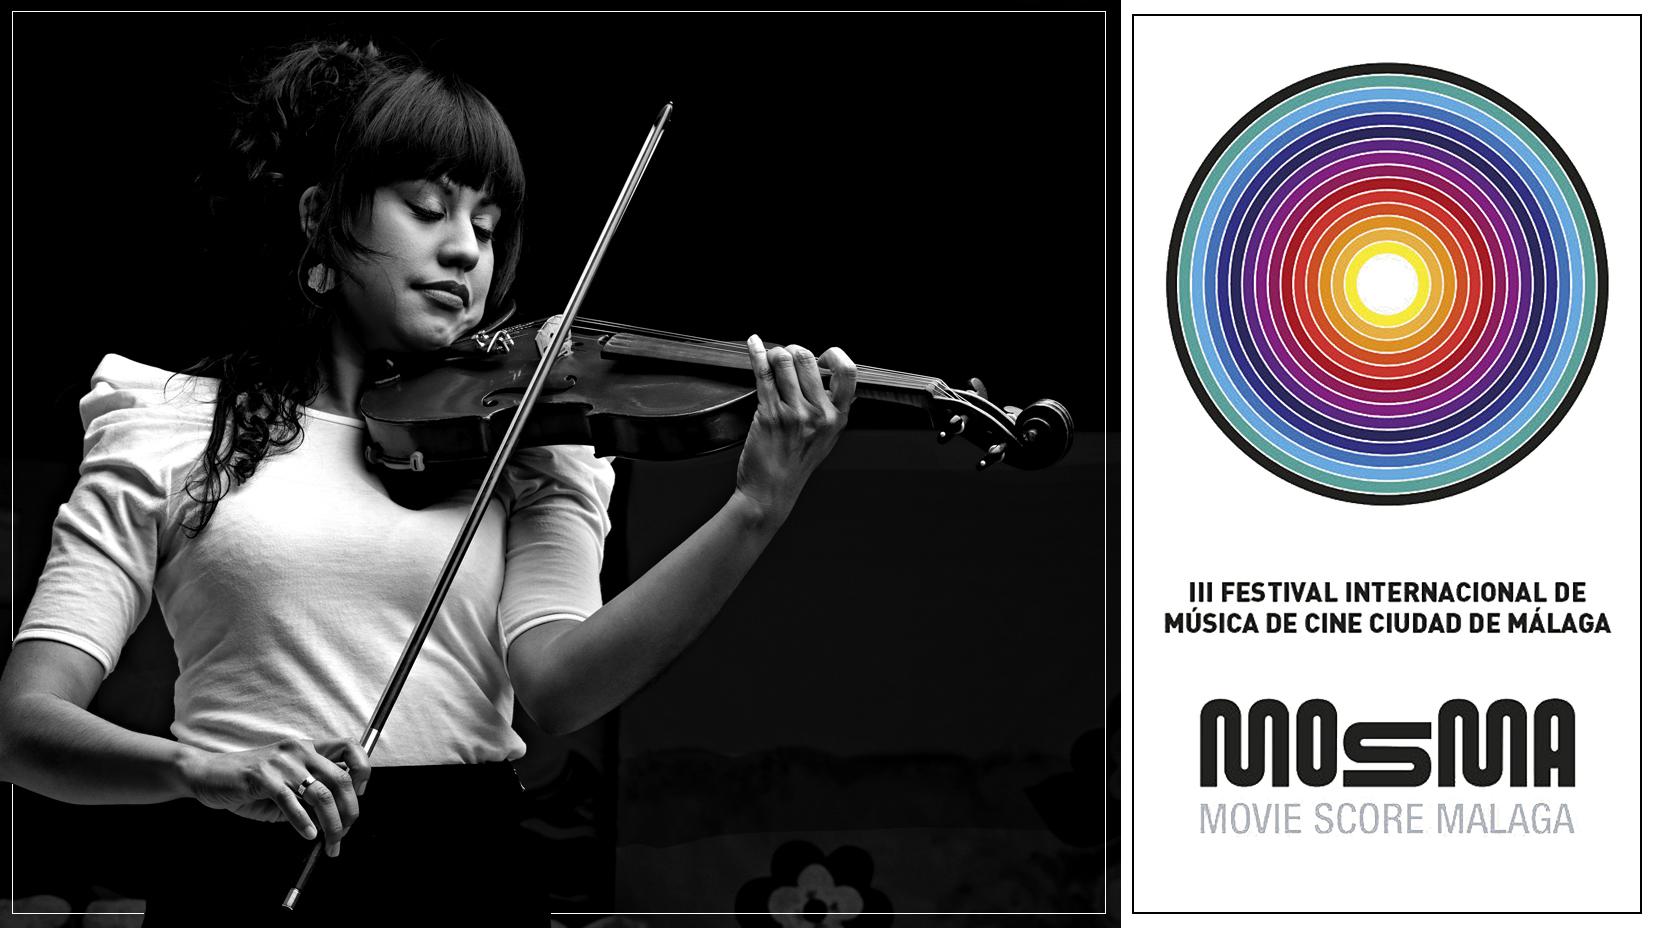 MOSMA – Movie Score Malaga